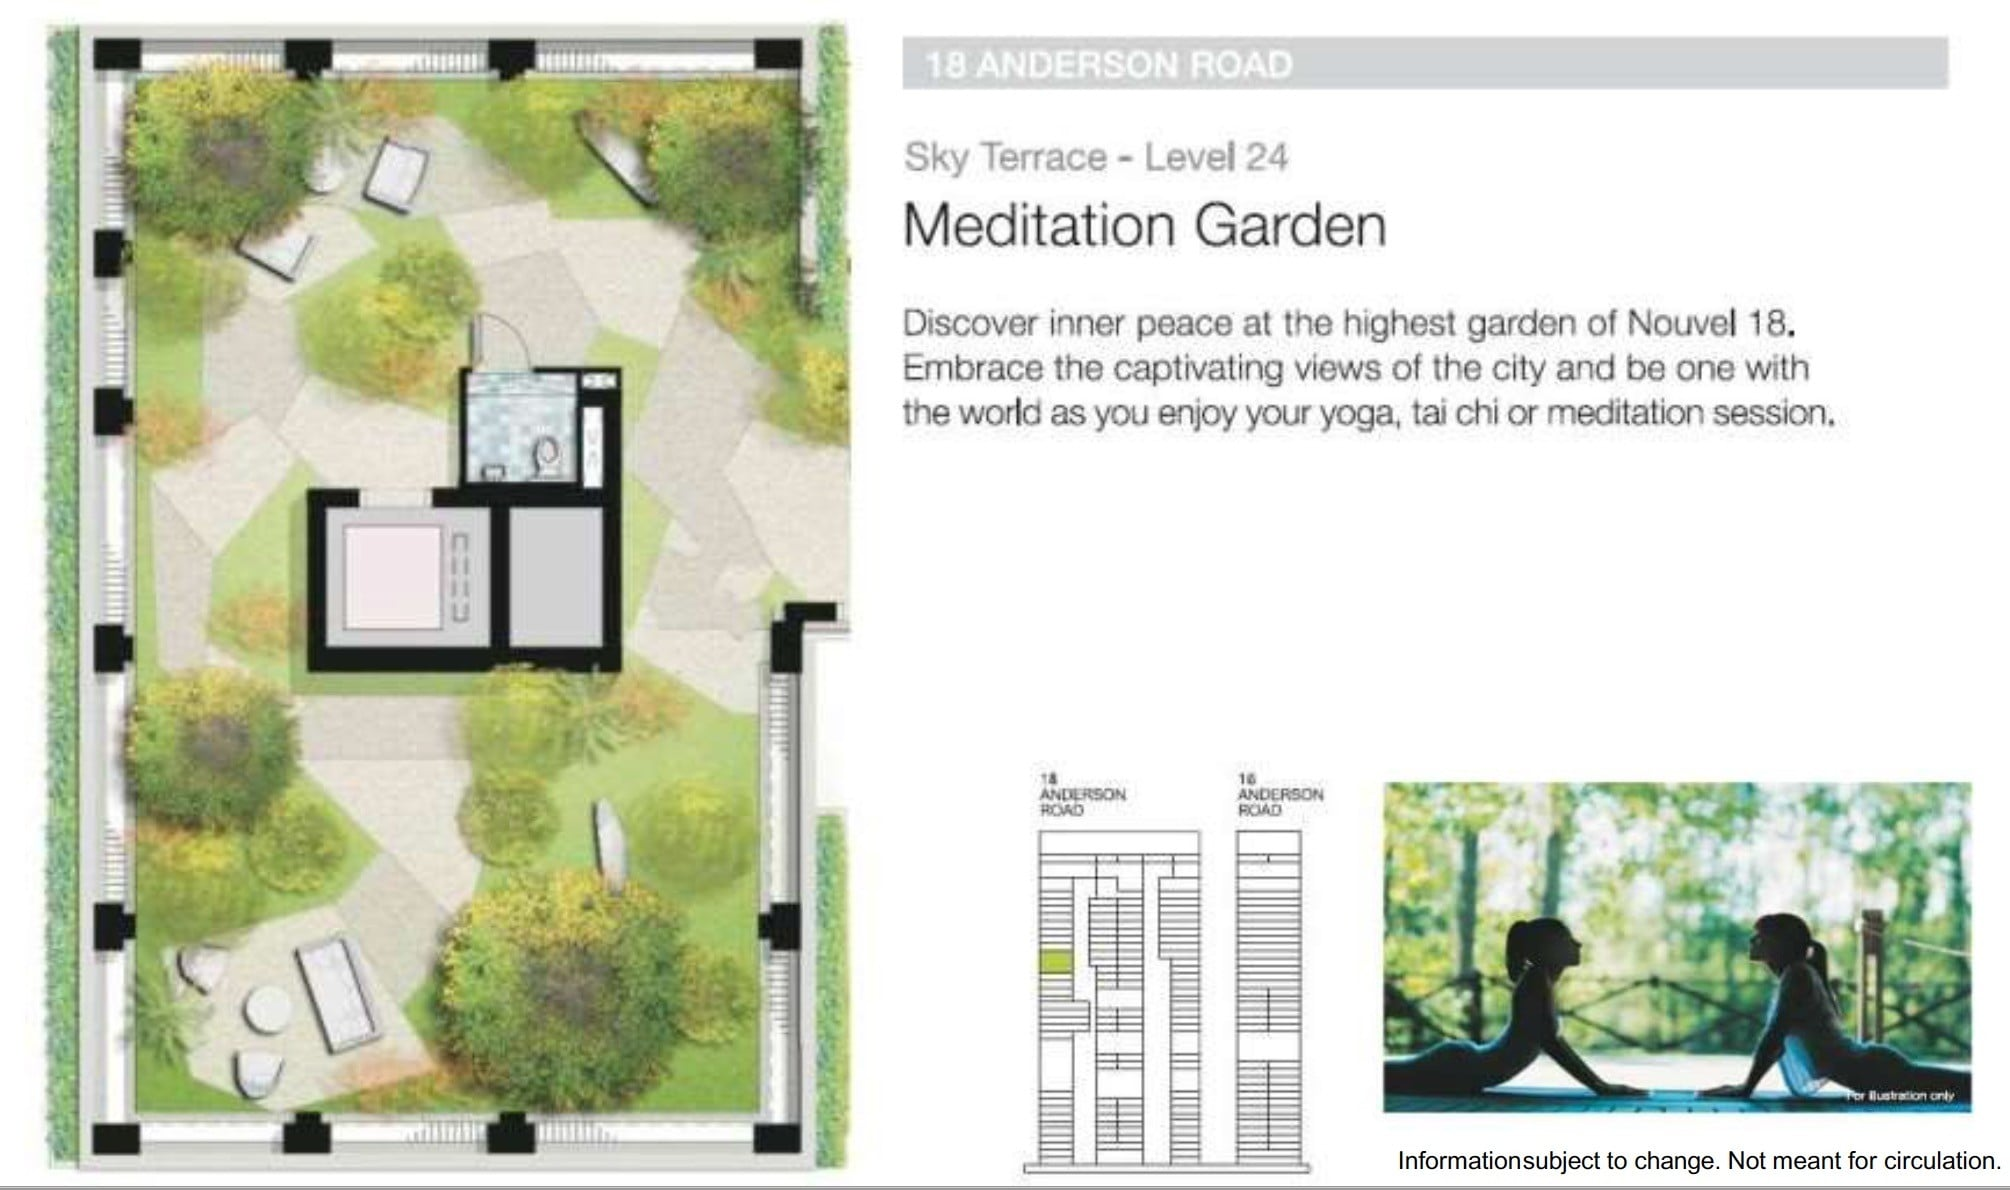 nuovel 18 -sky terrace level 24